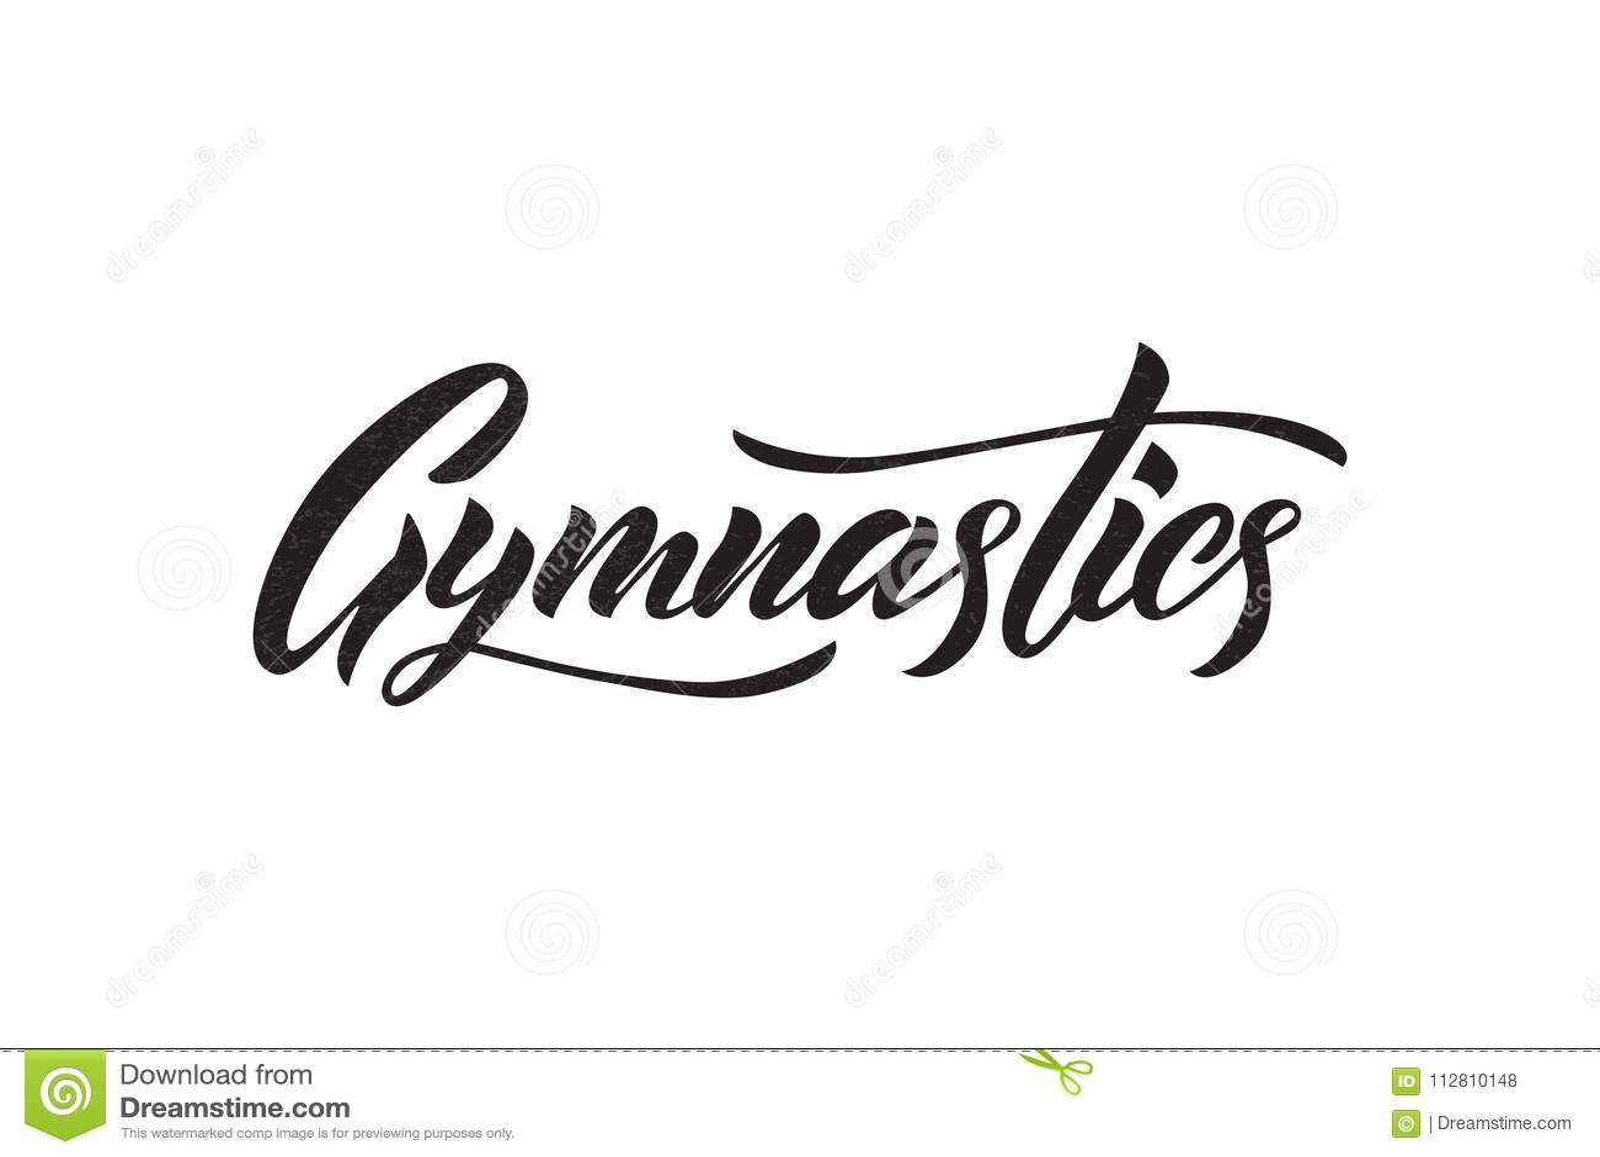 Vector Lettering Of Word Gymnastics Black Color Stock